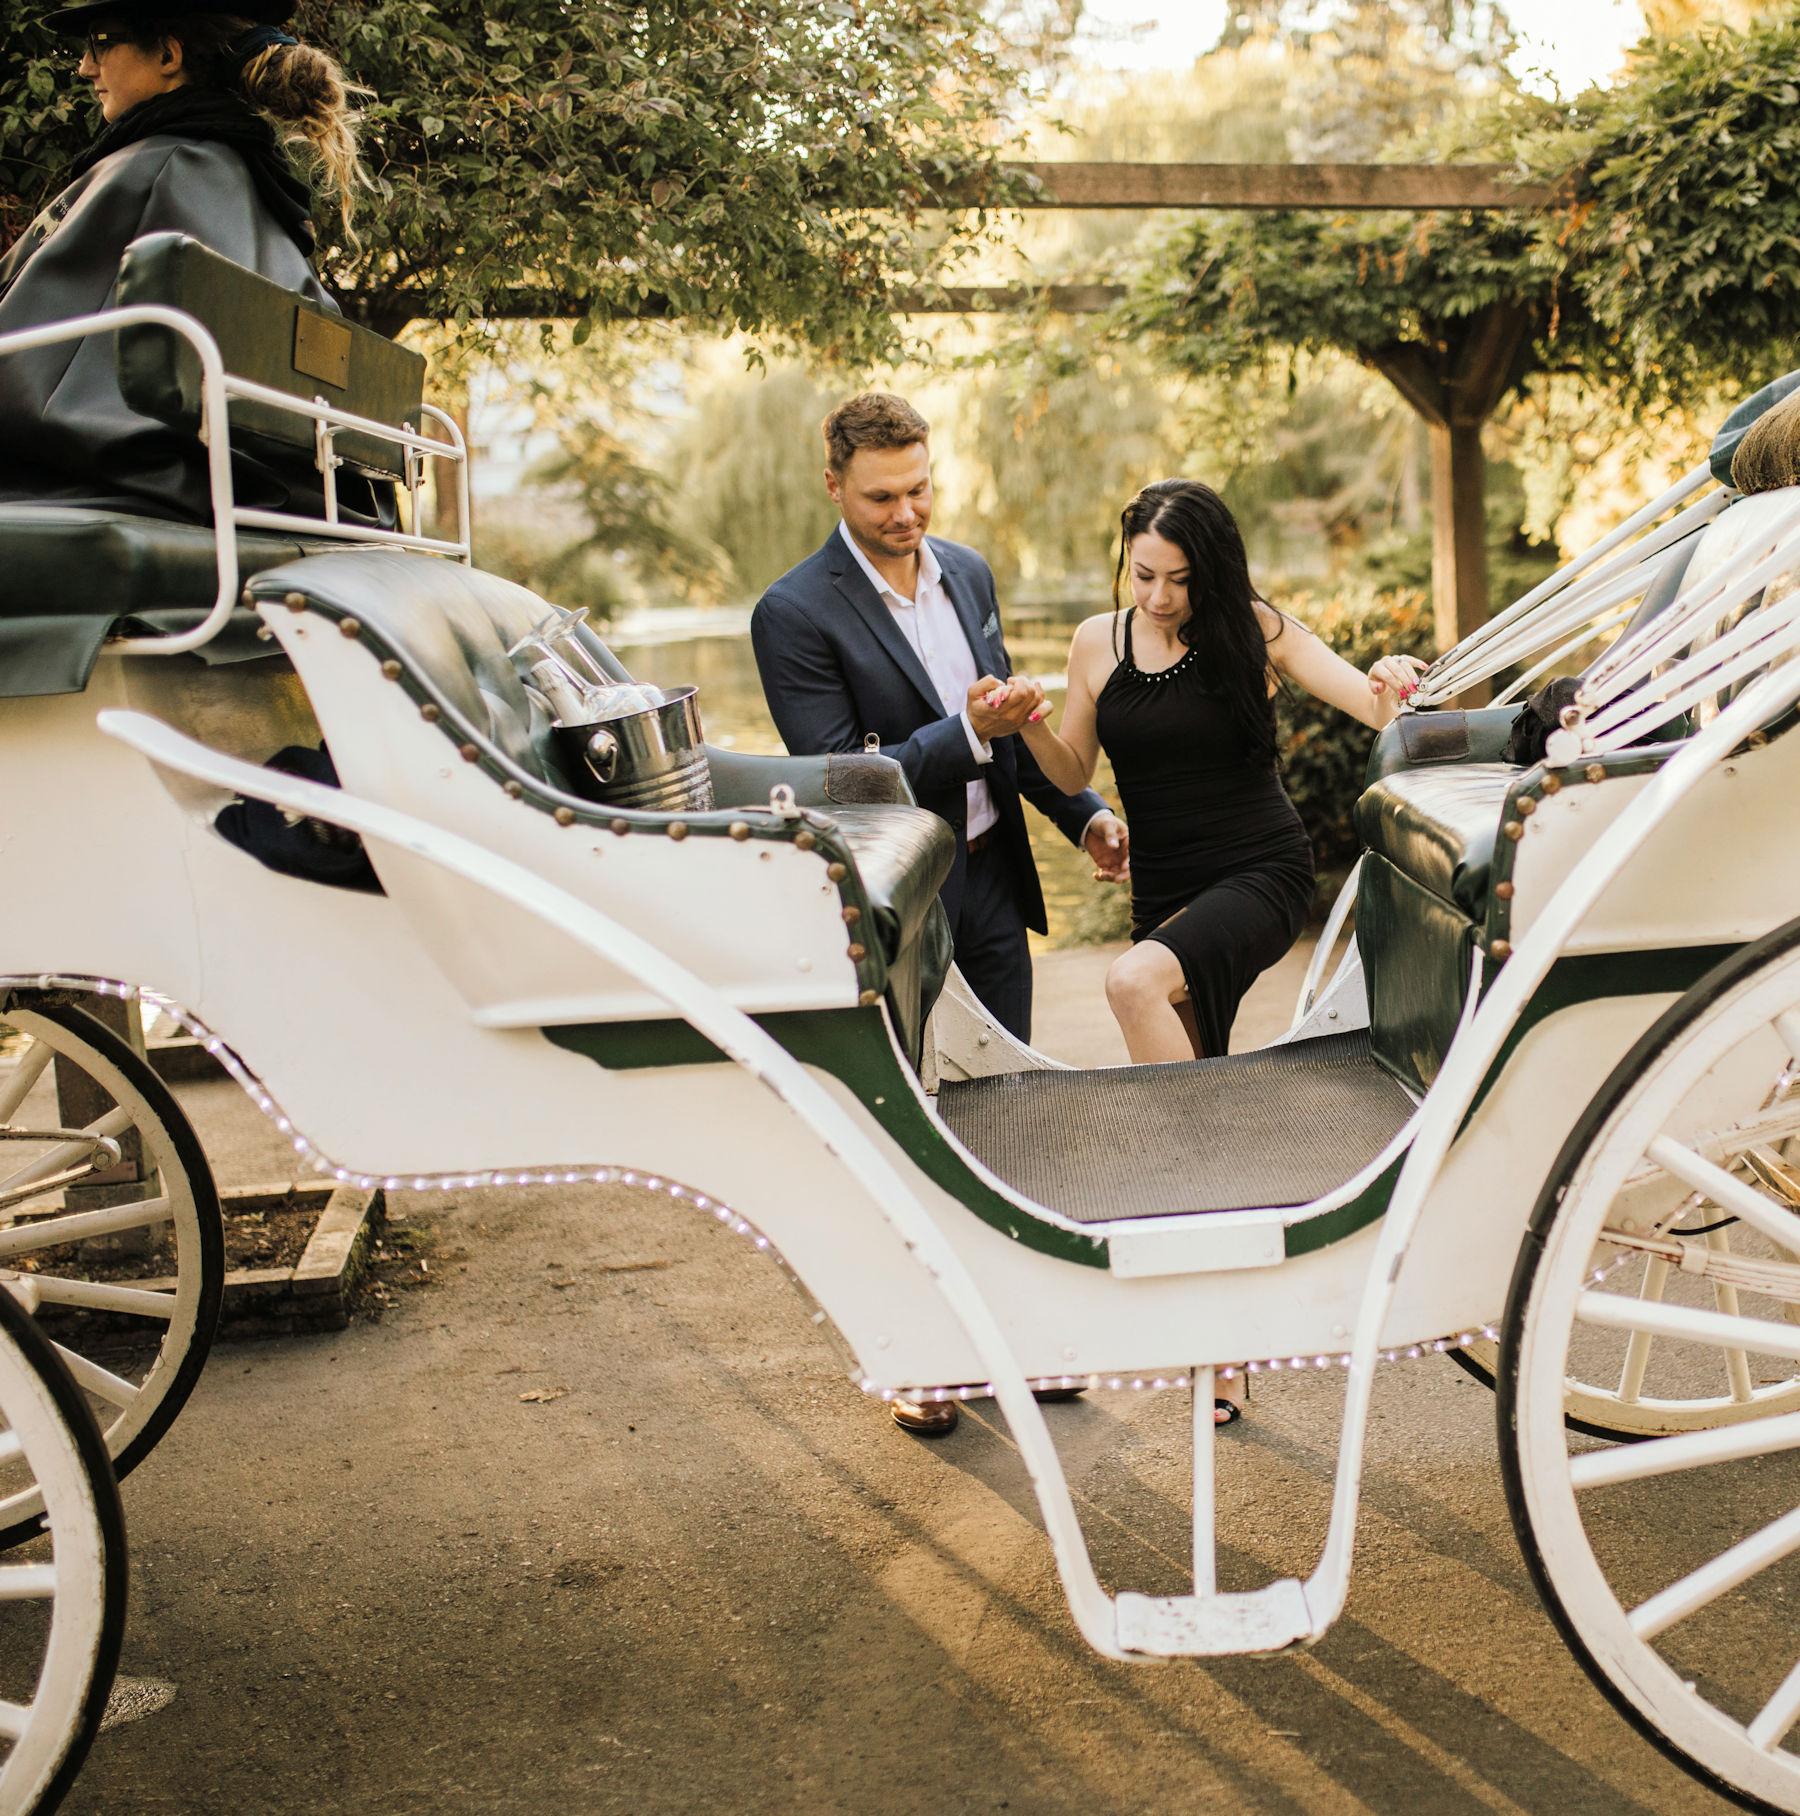 Victoria Carriage Tour Proposal